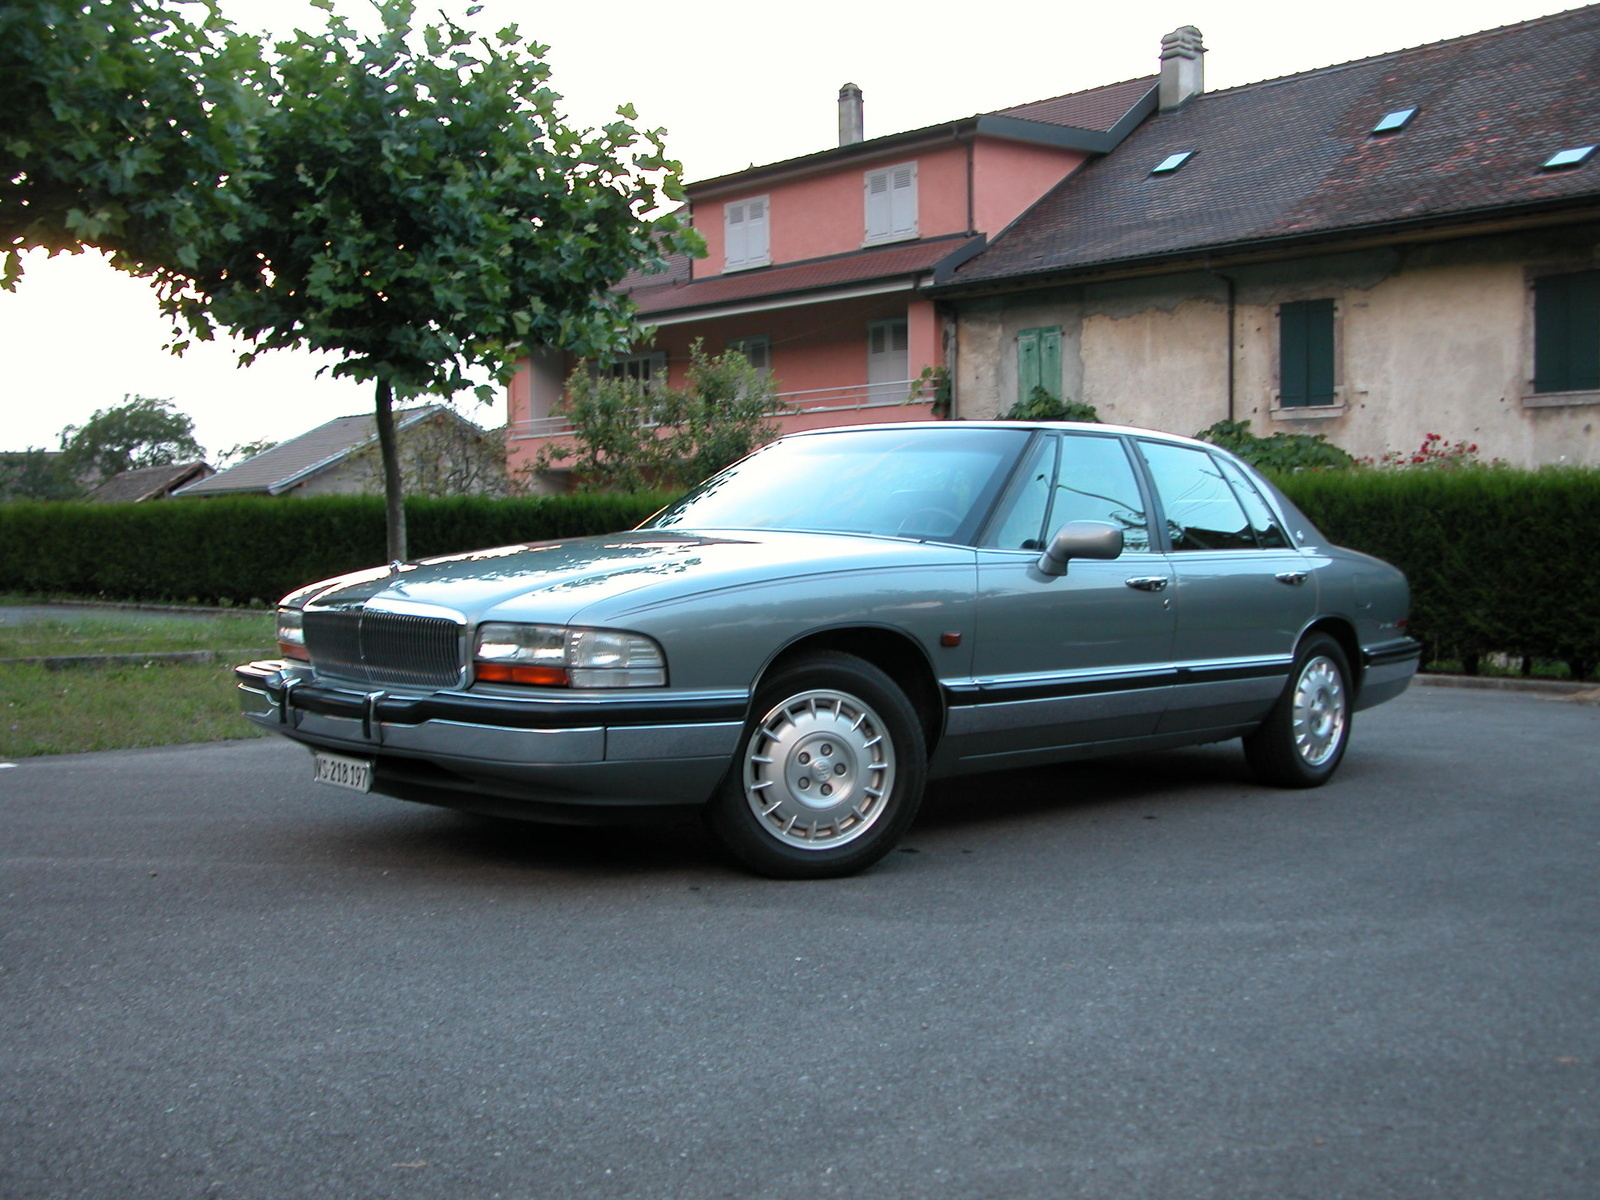 1996 Buick Lesabre >> 1996 Buick Lesabre User Reviews Cargurus